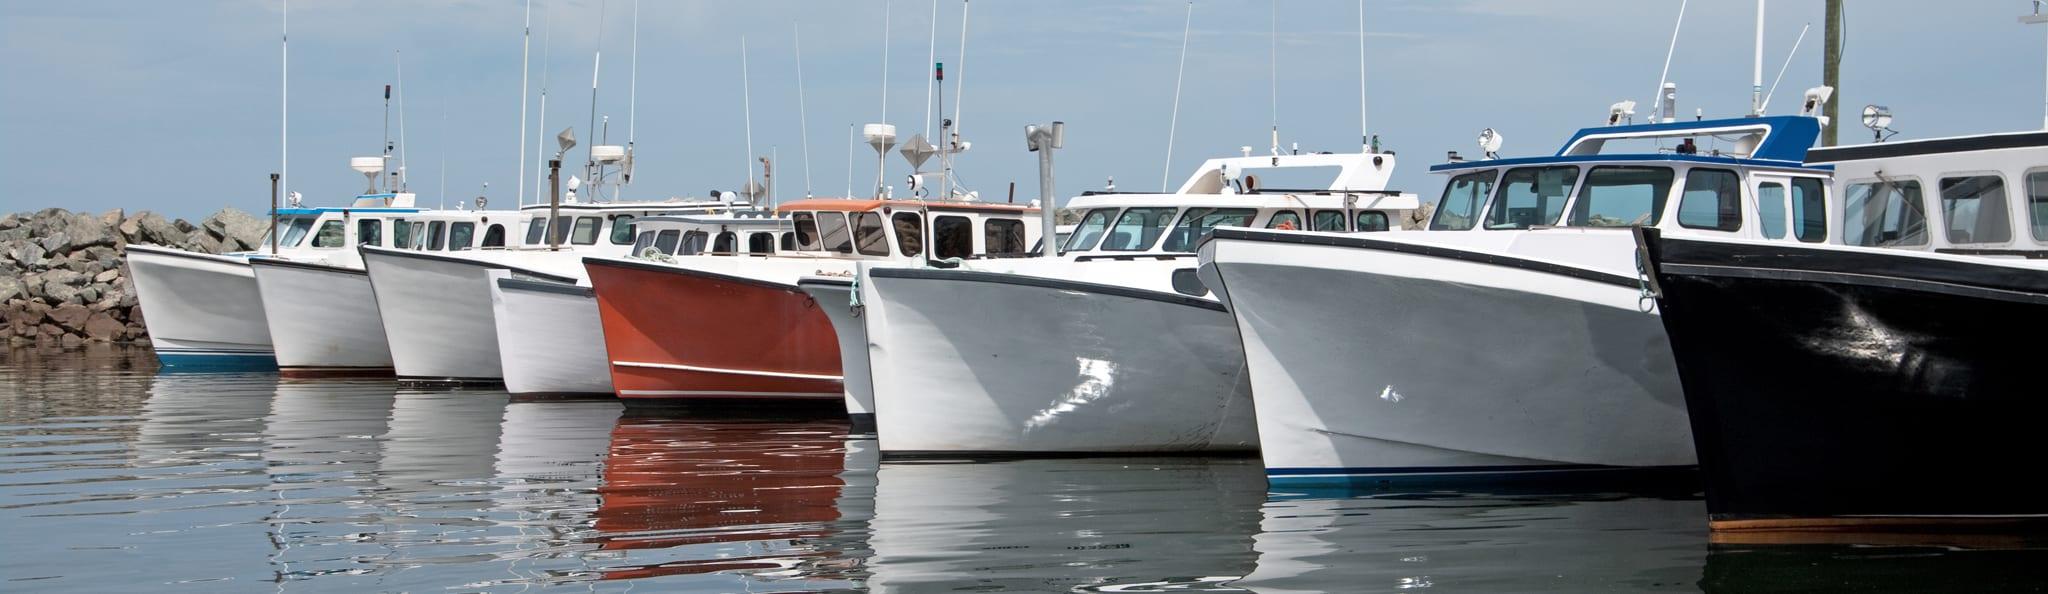 Boats-on-Wharf-Nova-Scotia